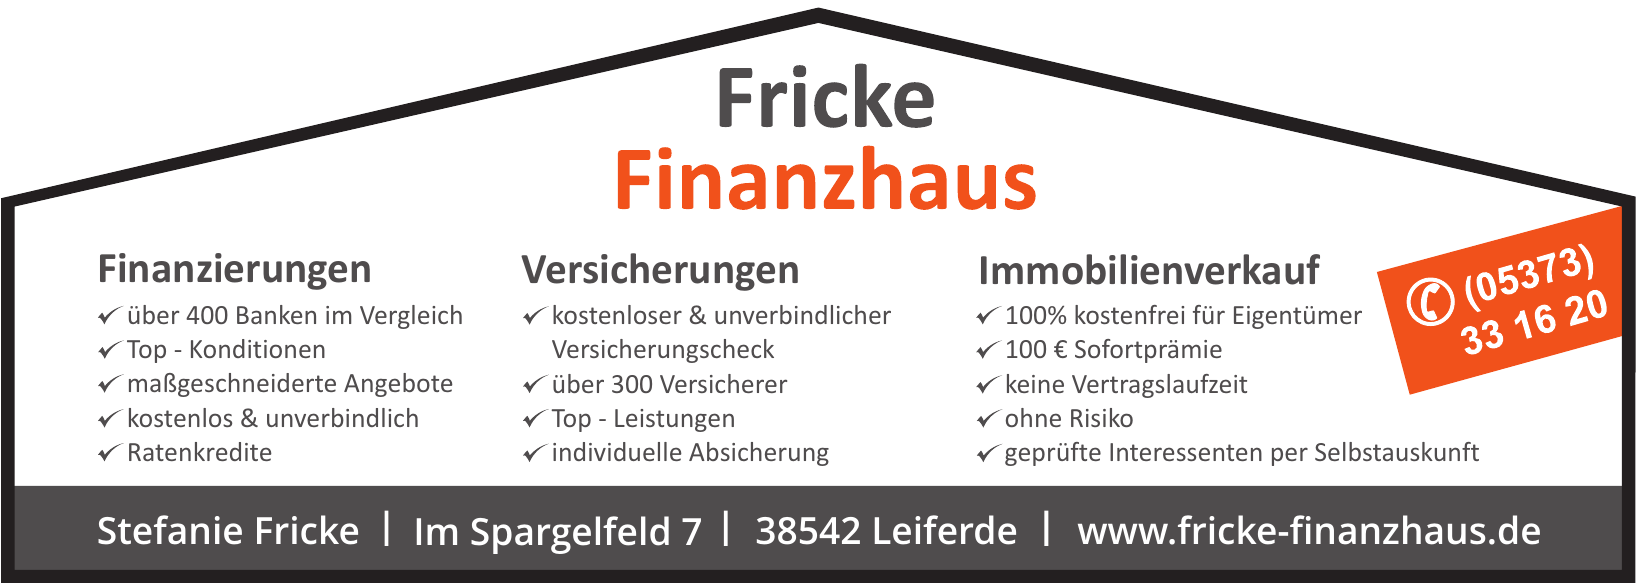 Fricke Finanzhaus